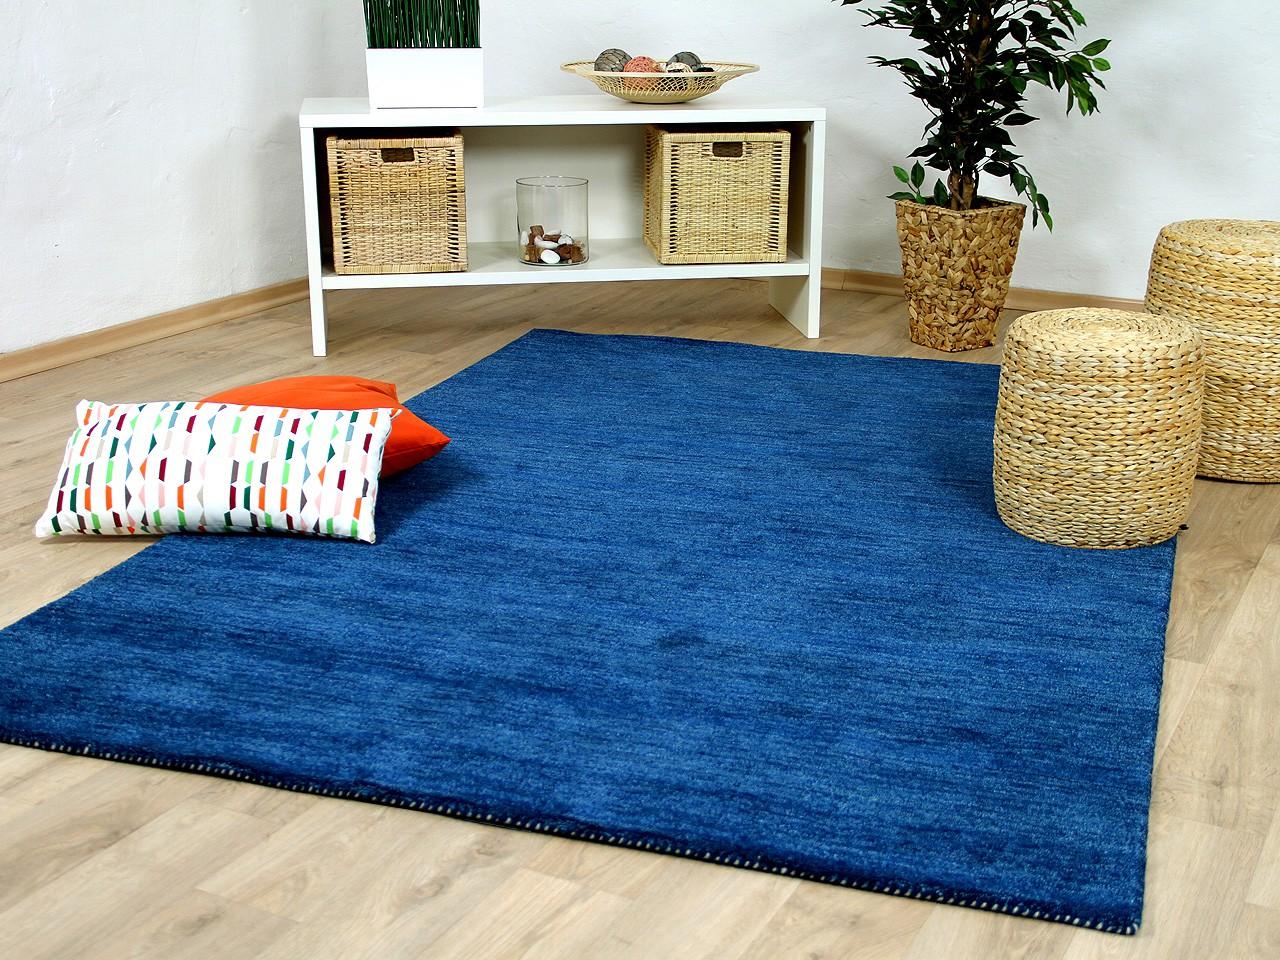 natur teppich indo gabbeh ella blau teppiche nepal gabbeh und kelim teppiche indo gabbeh teppiche. Black Bedroom Furniture Sets. Home Design Ideas